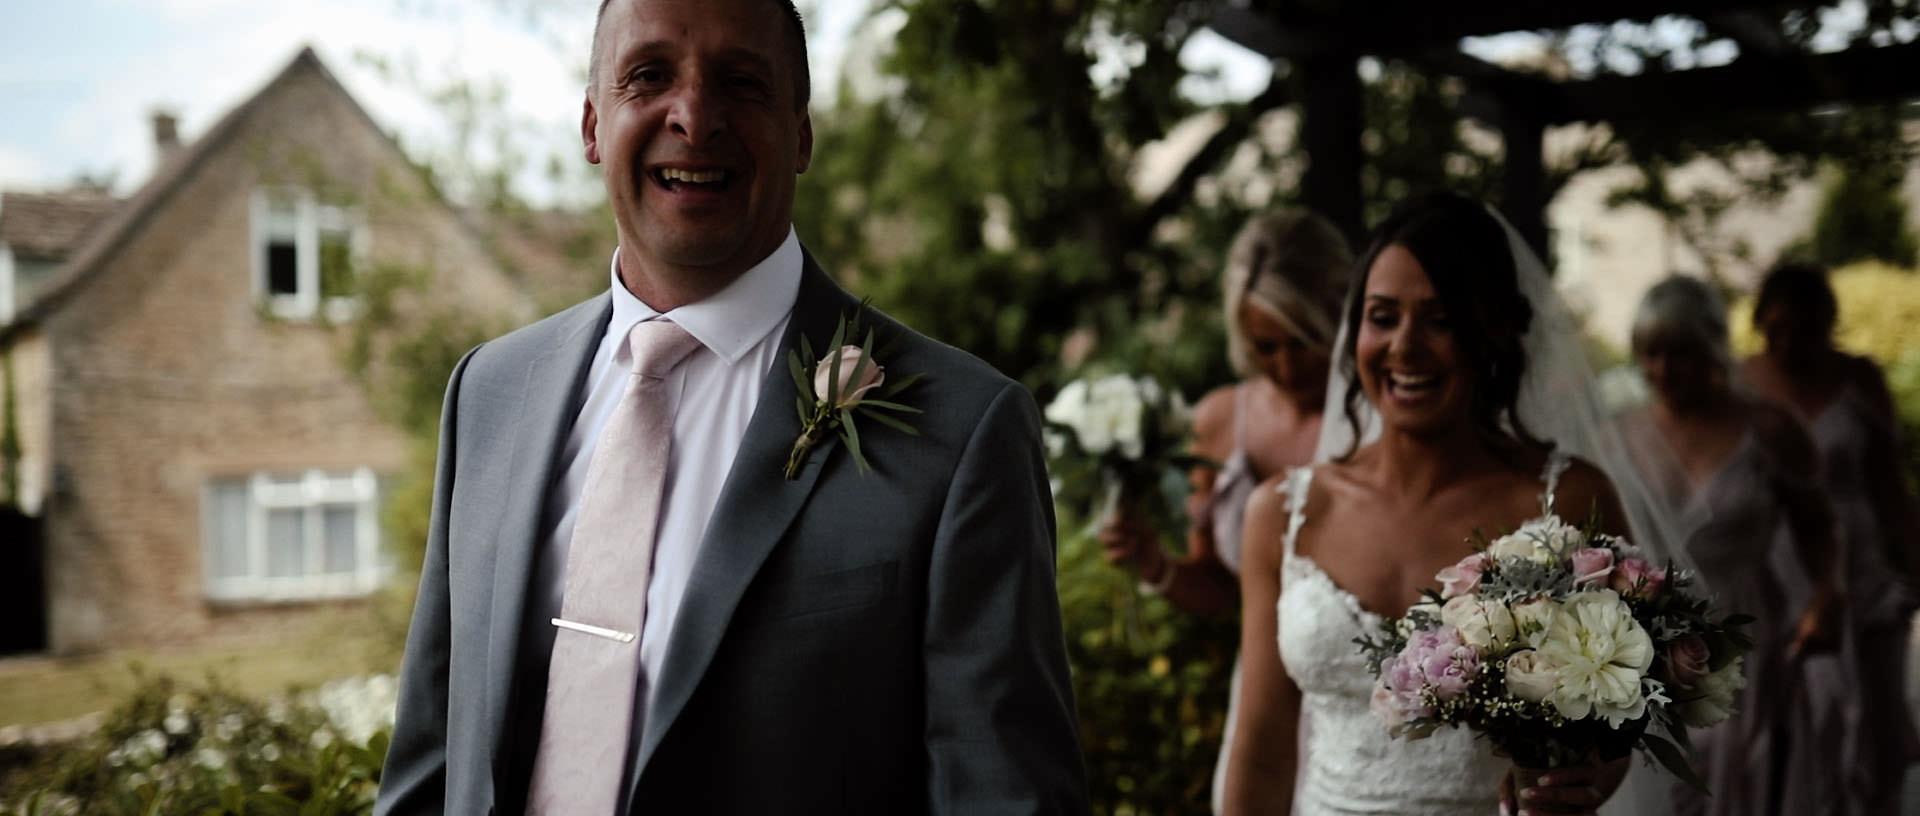 Hyde Barn Colswolds Wedding Verity-Jade & Kai 18 Cropped.jpg